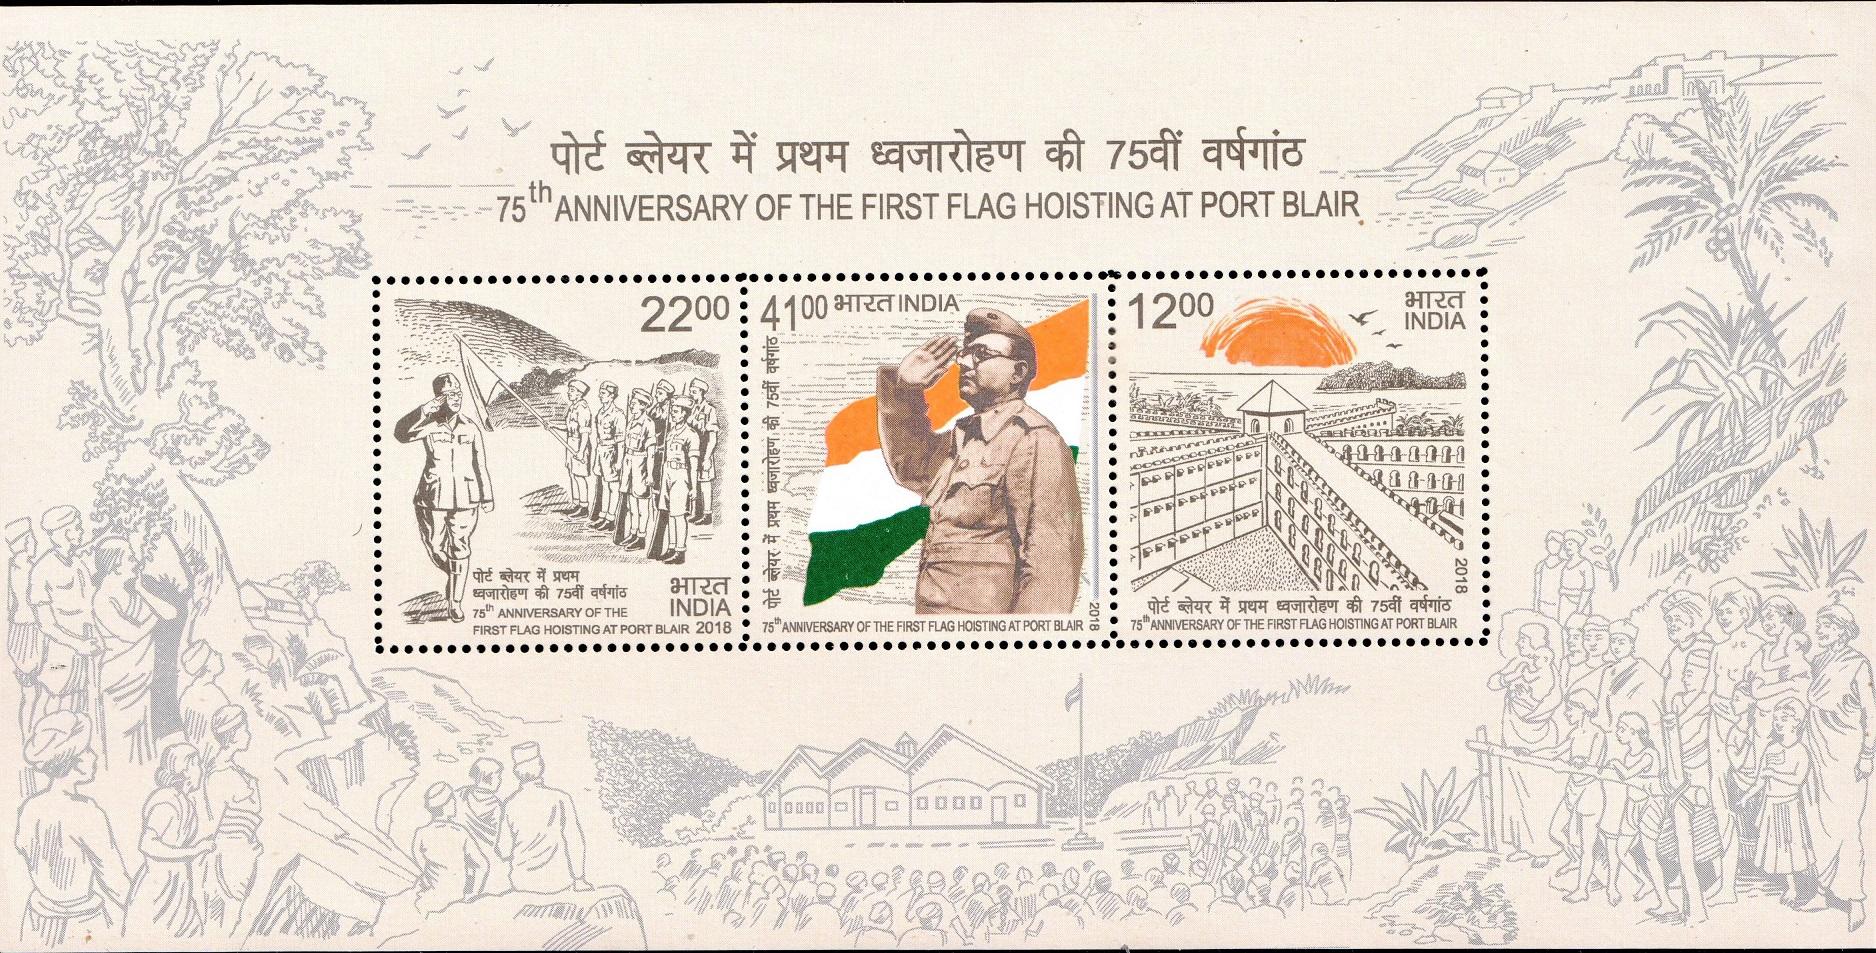 Netaji with Azad Hind Fauj, Indian Flag and Cellular Jail